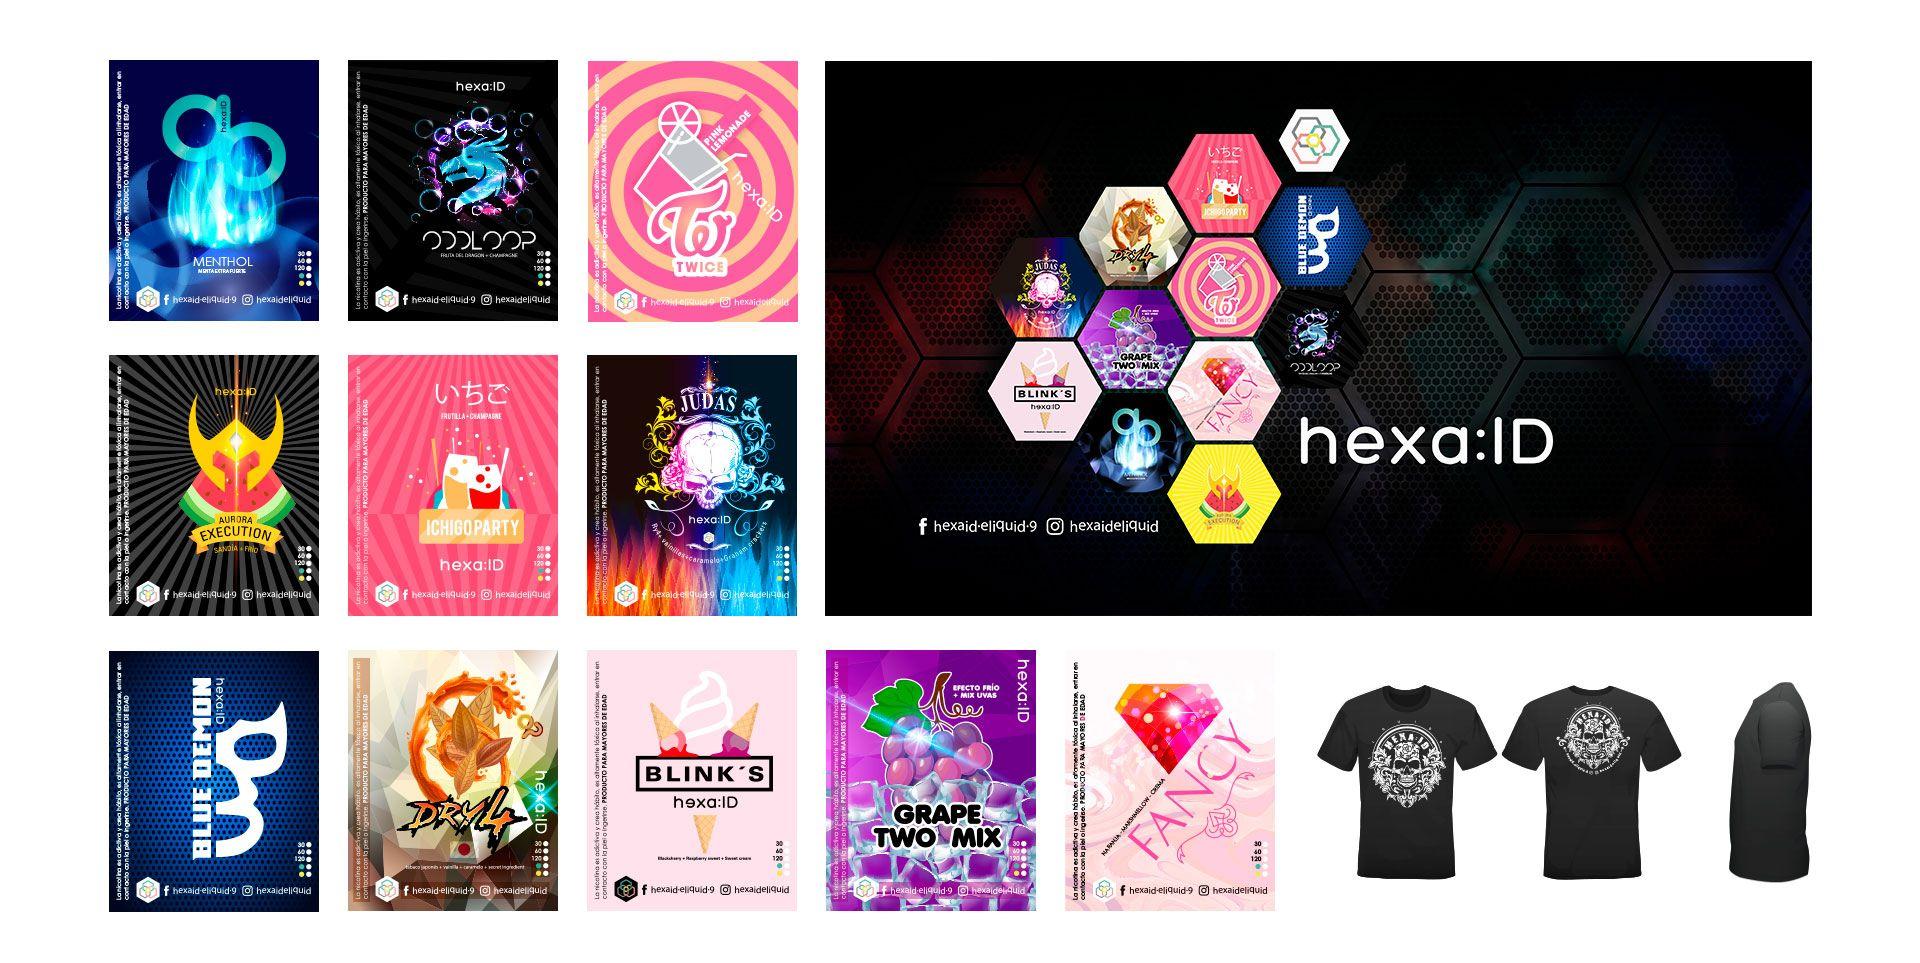 hexaid-imprenta-002